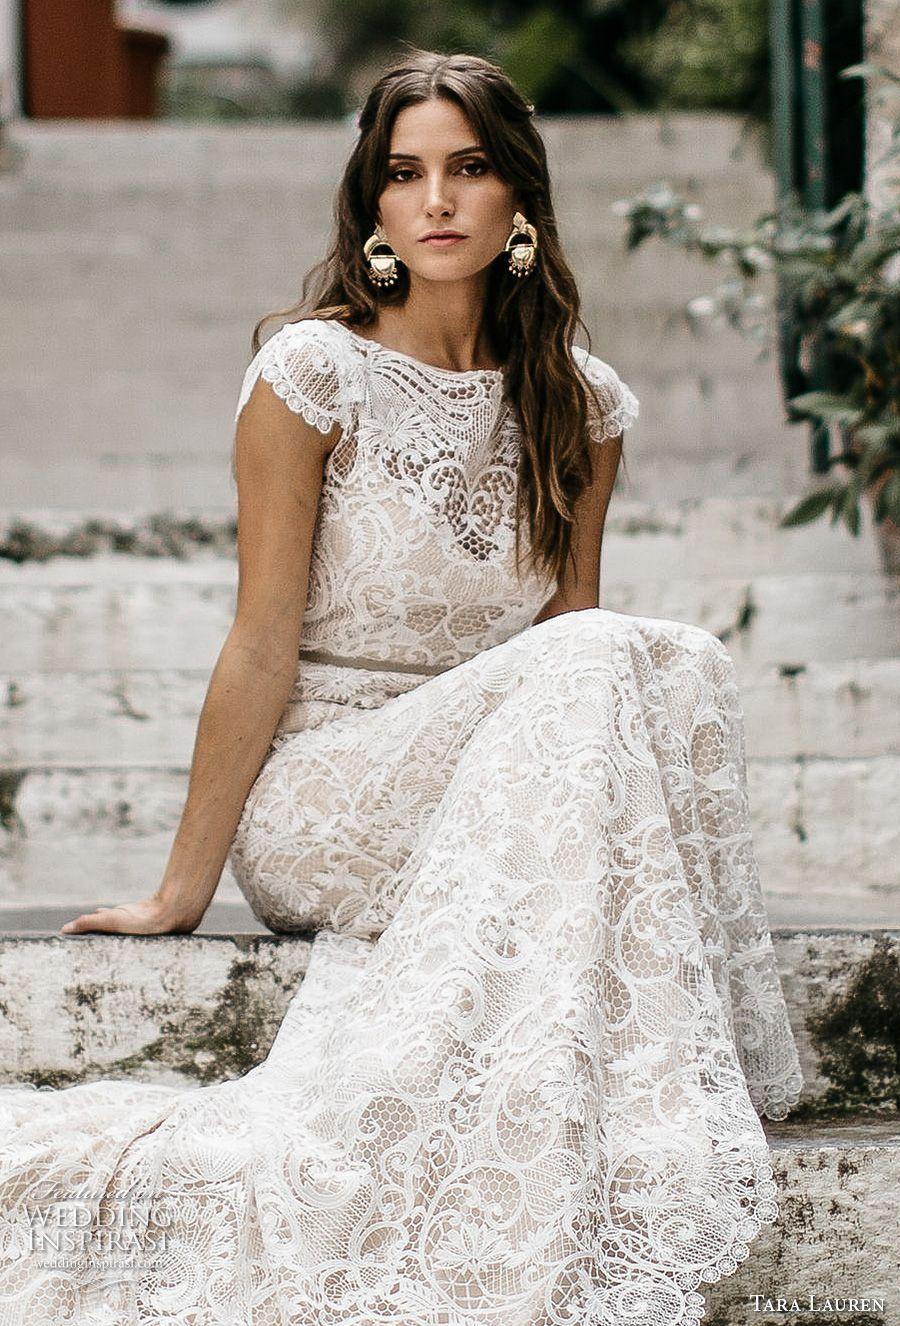 Tara lauren spring wedding dresses u ucseafarerud bridal